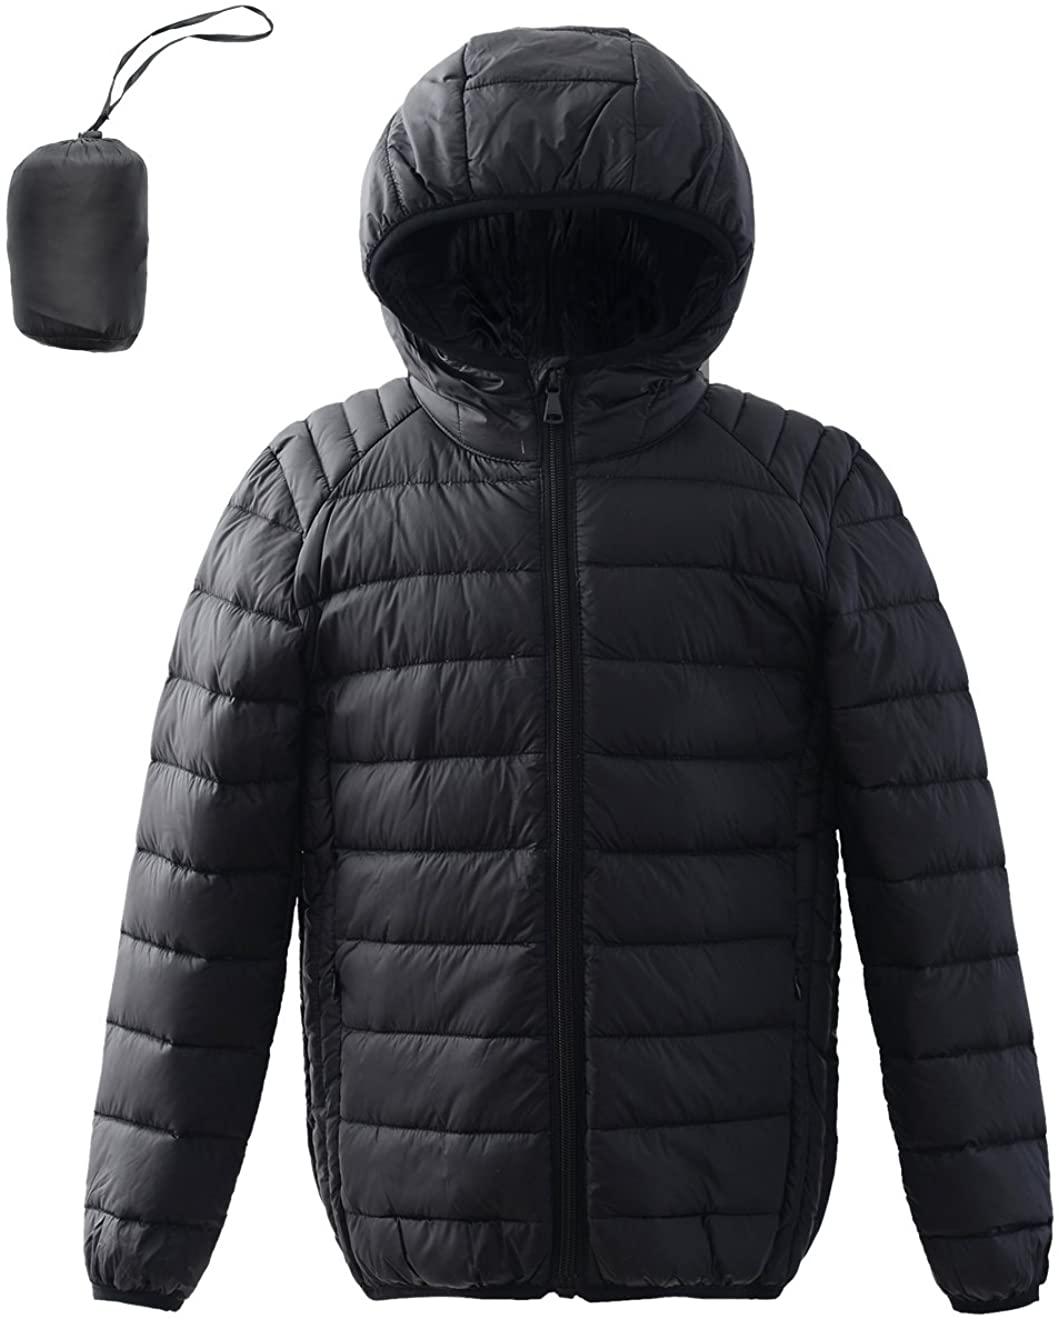 M2C Boys Girls Hooded Ultra Light Packable Windproof Down Jacket